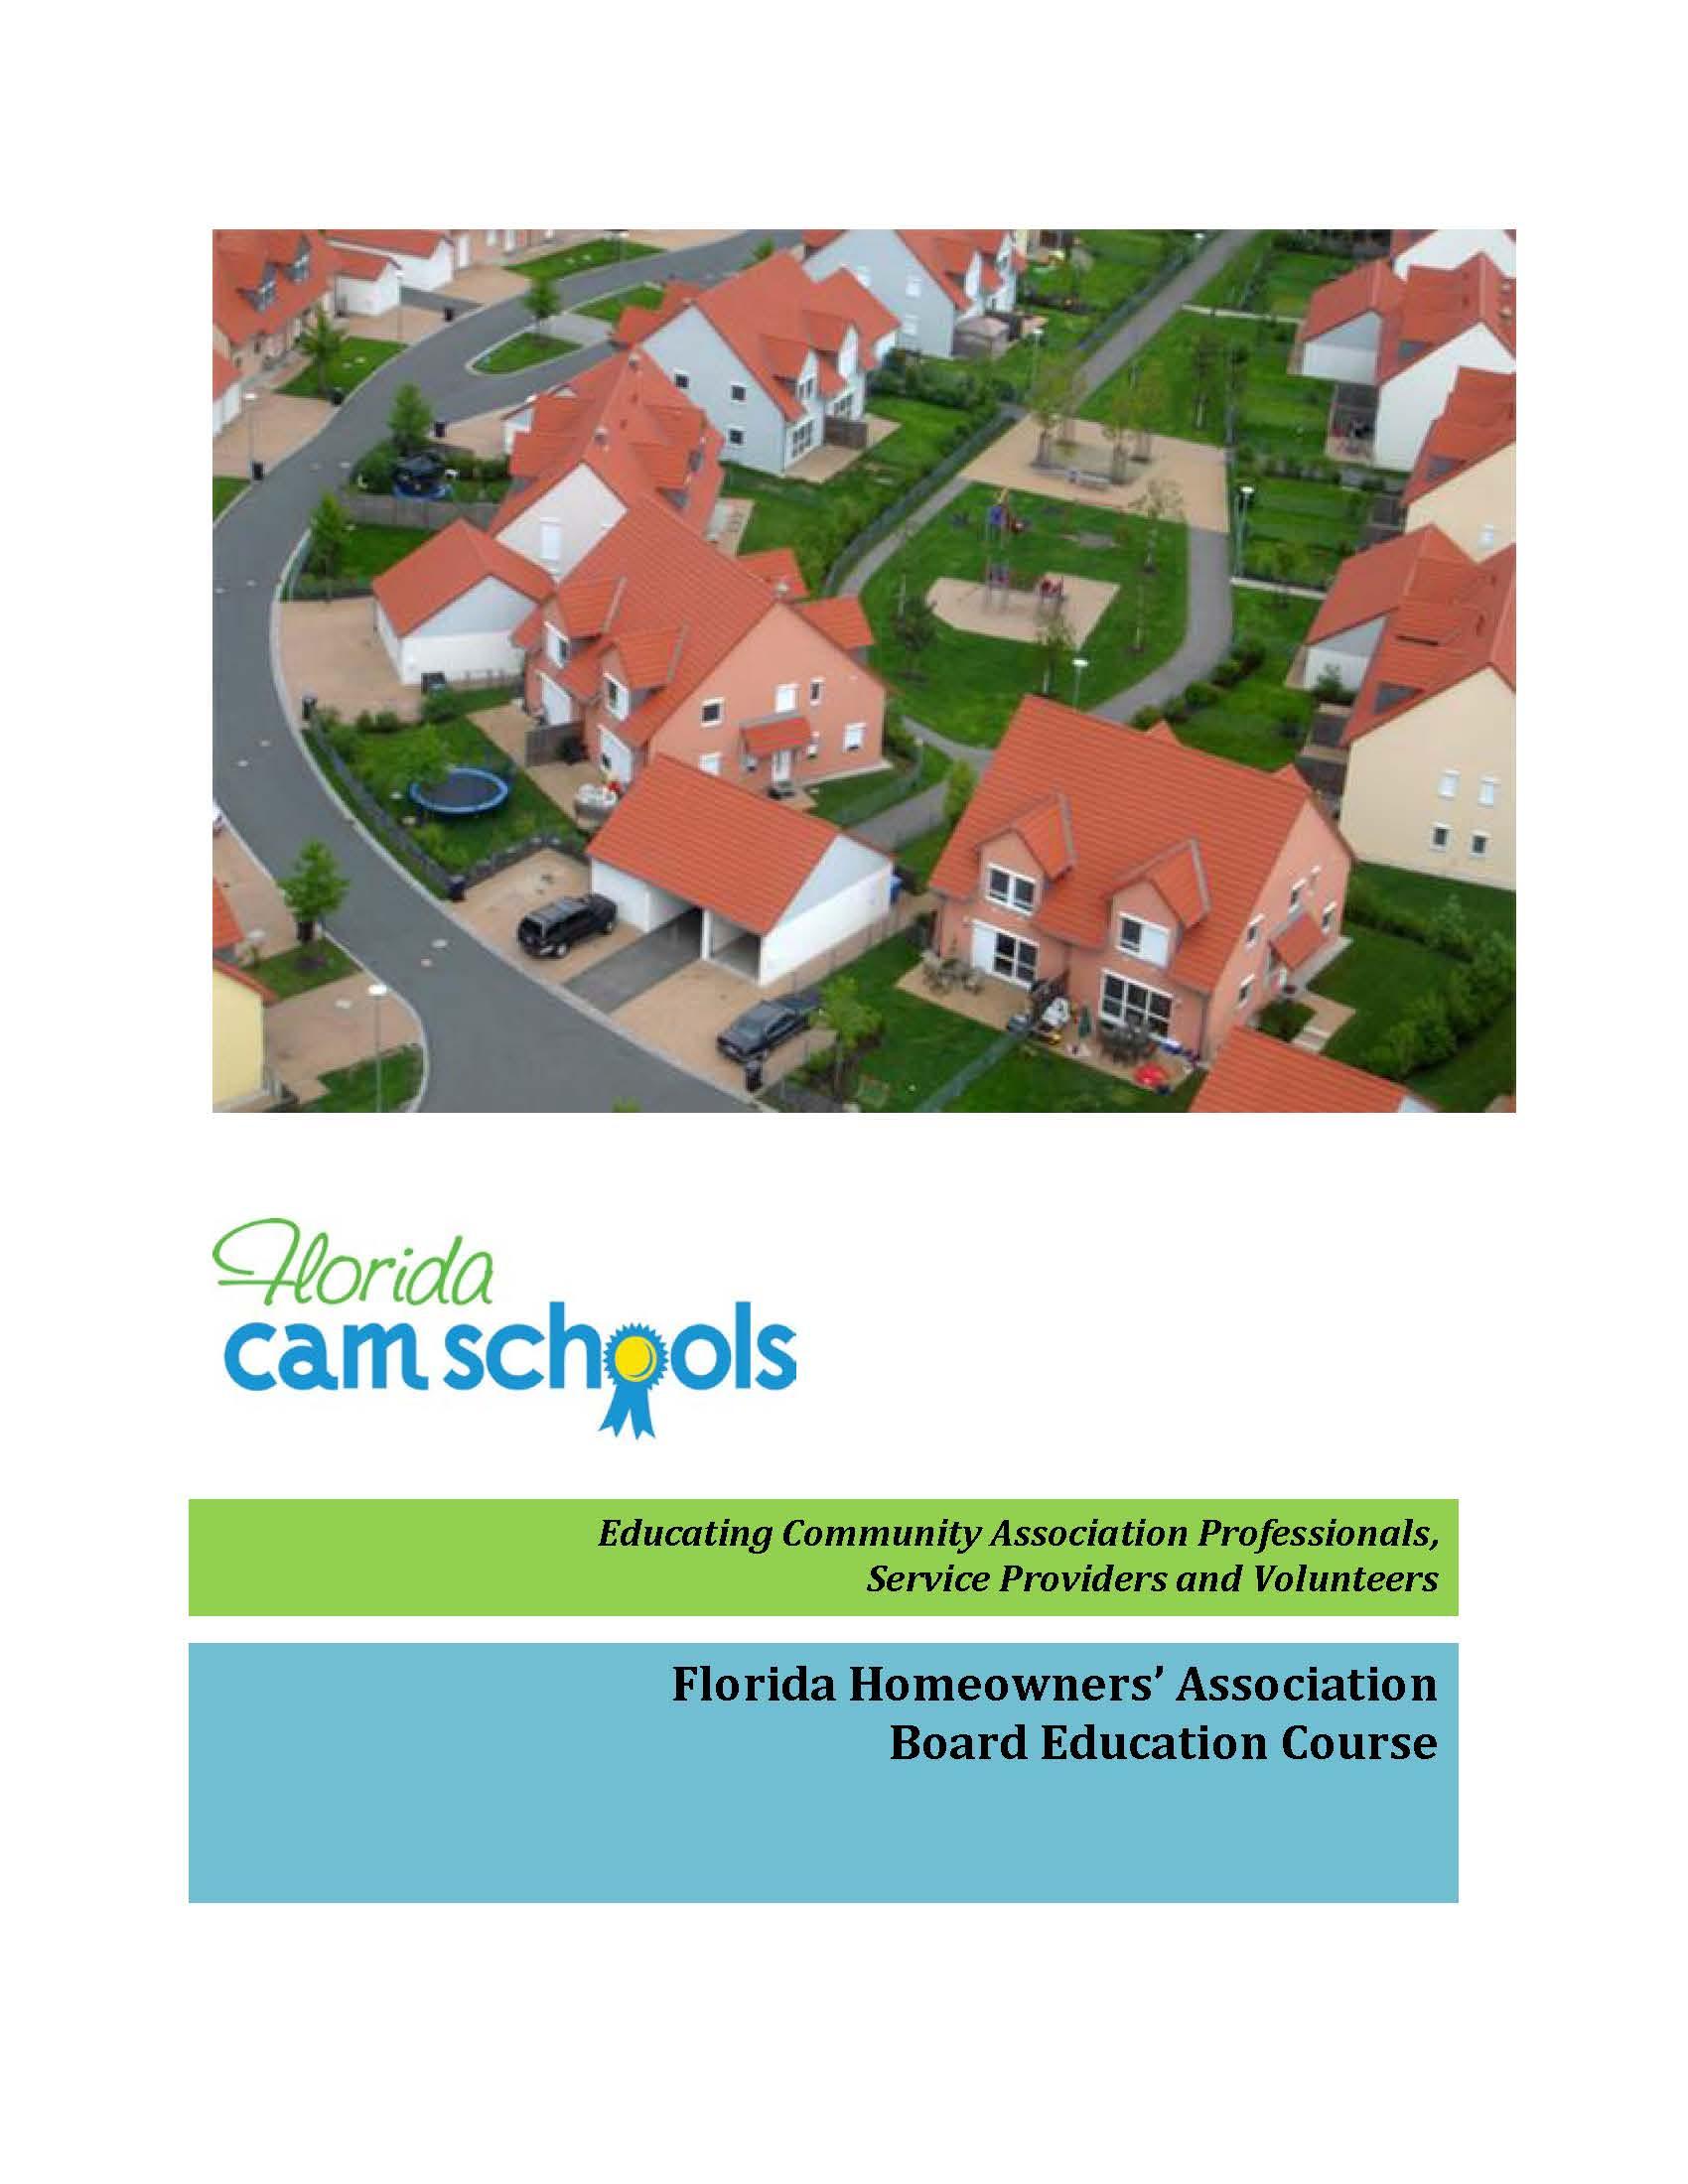 Florida Homeowners' Association Board Education Course – Self Study